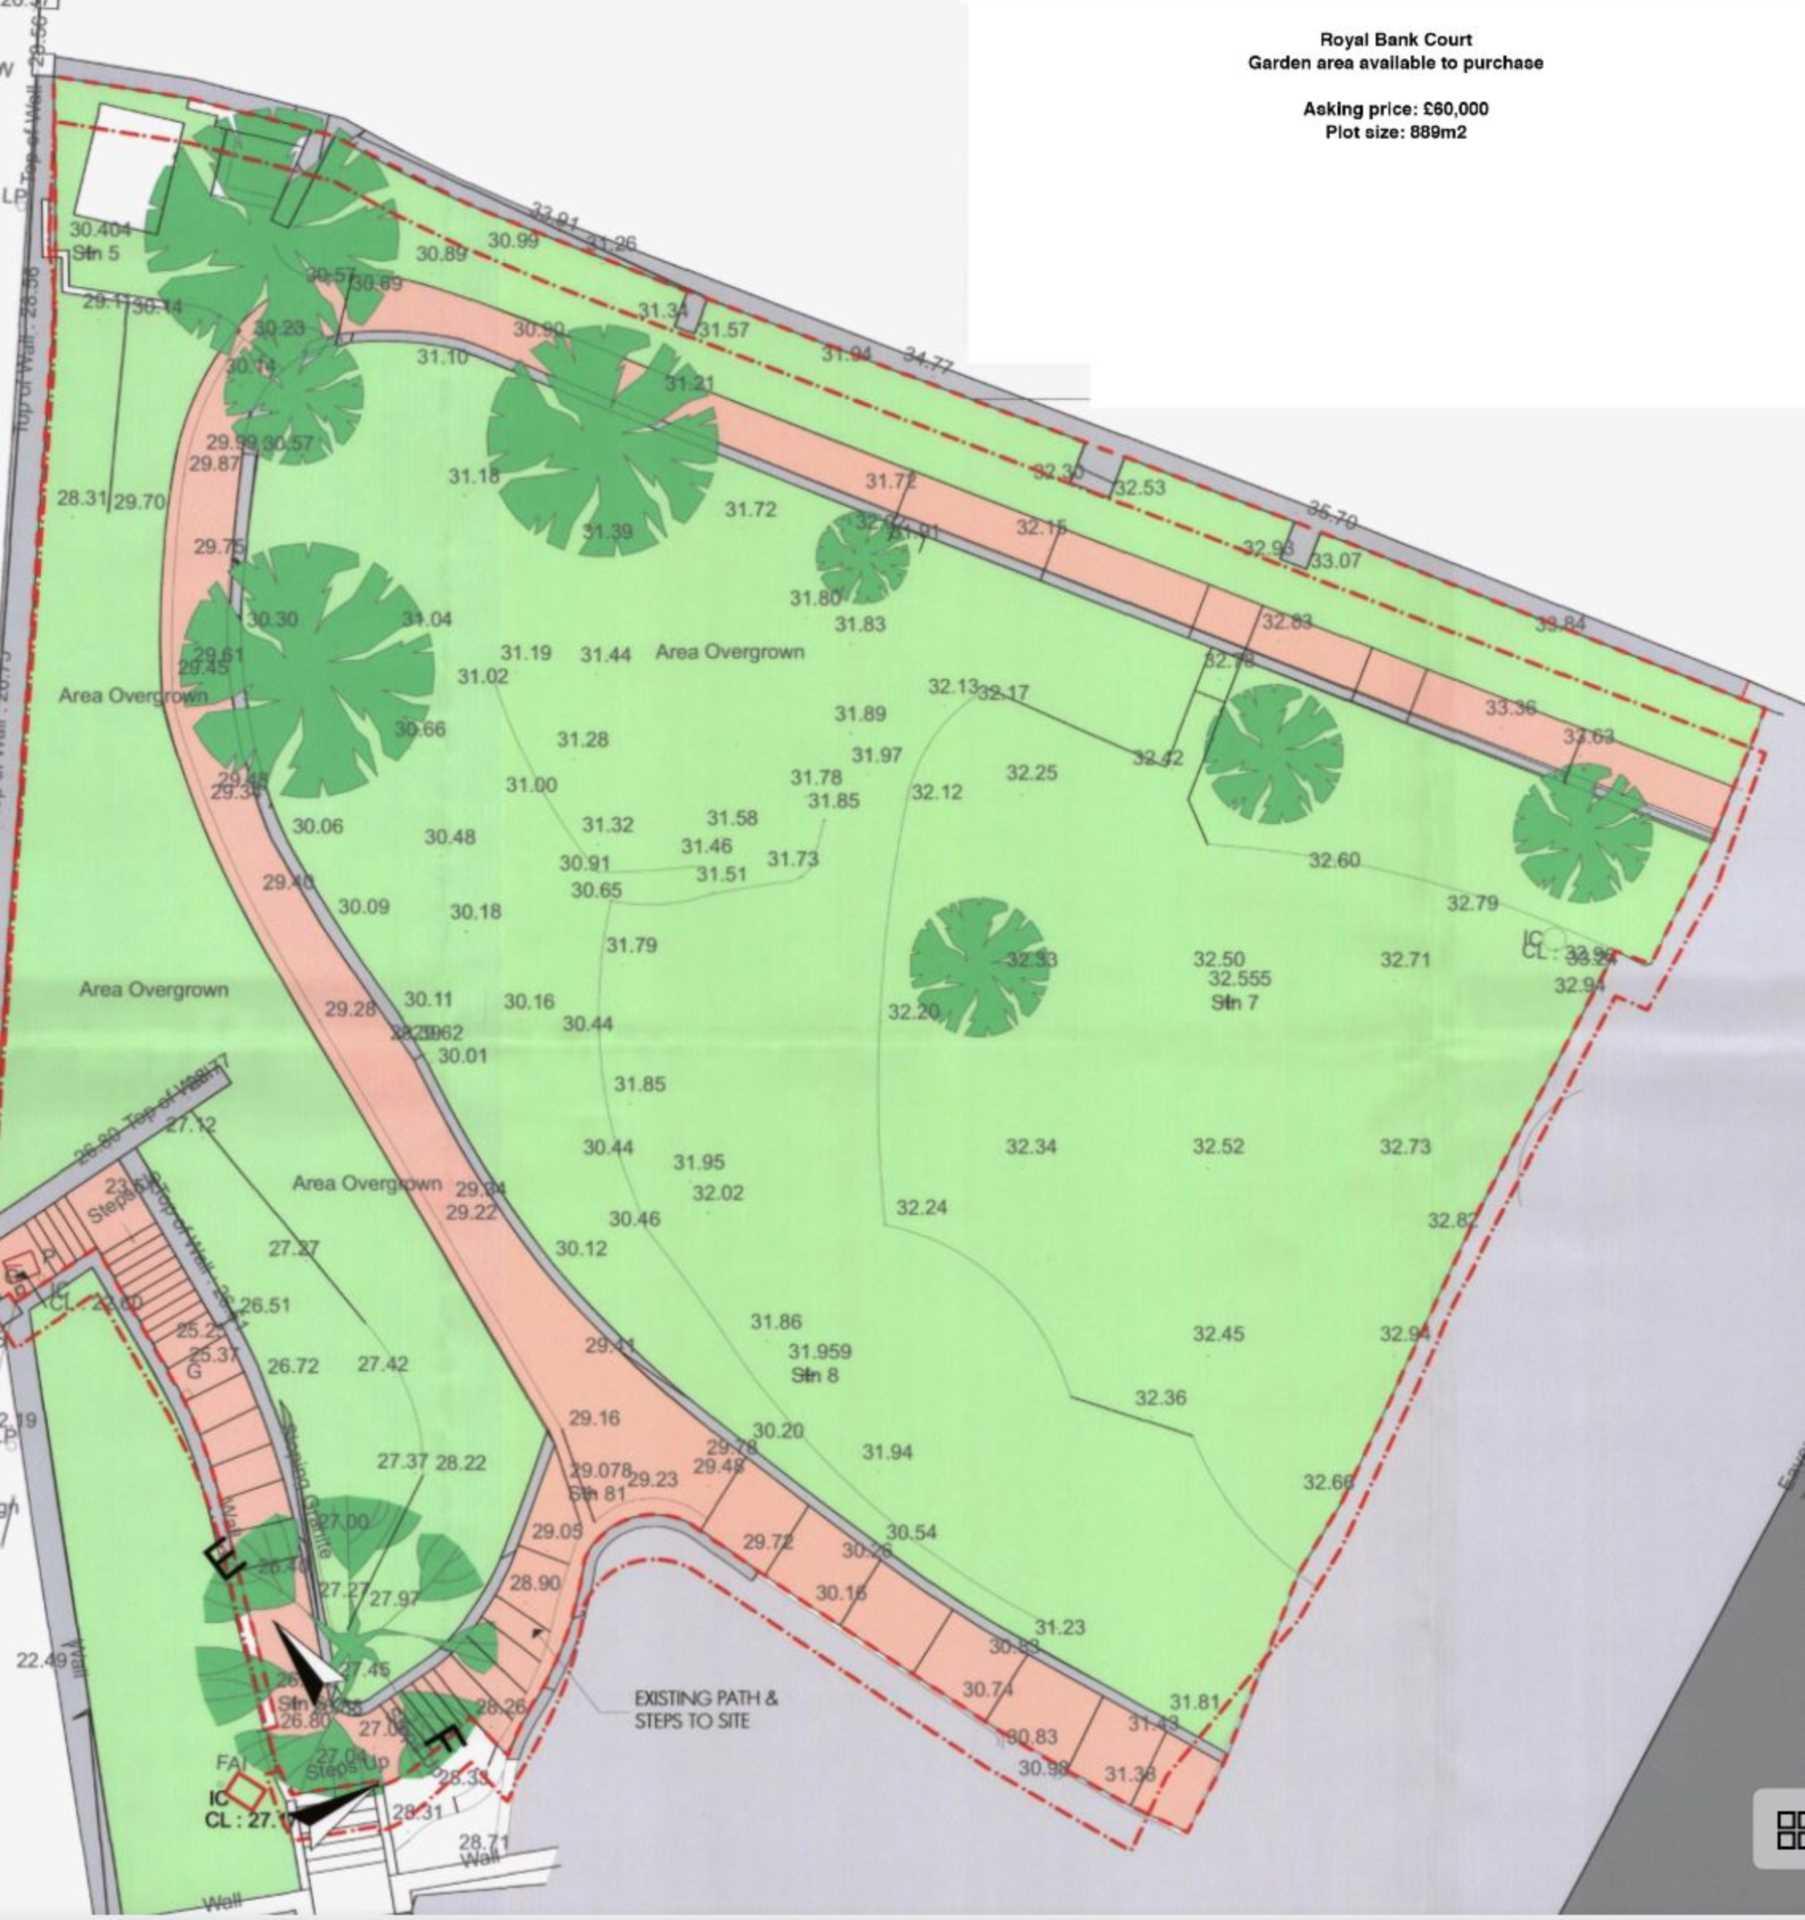 Development potential - St Helier, Image 2